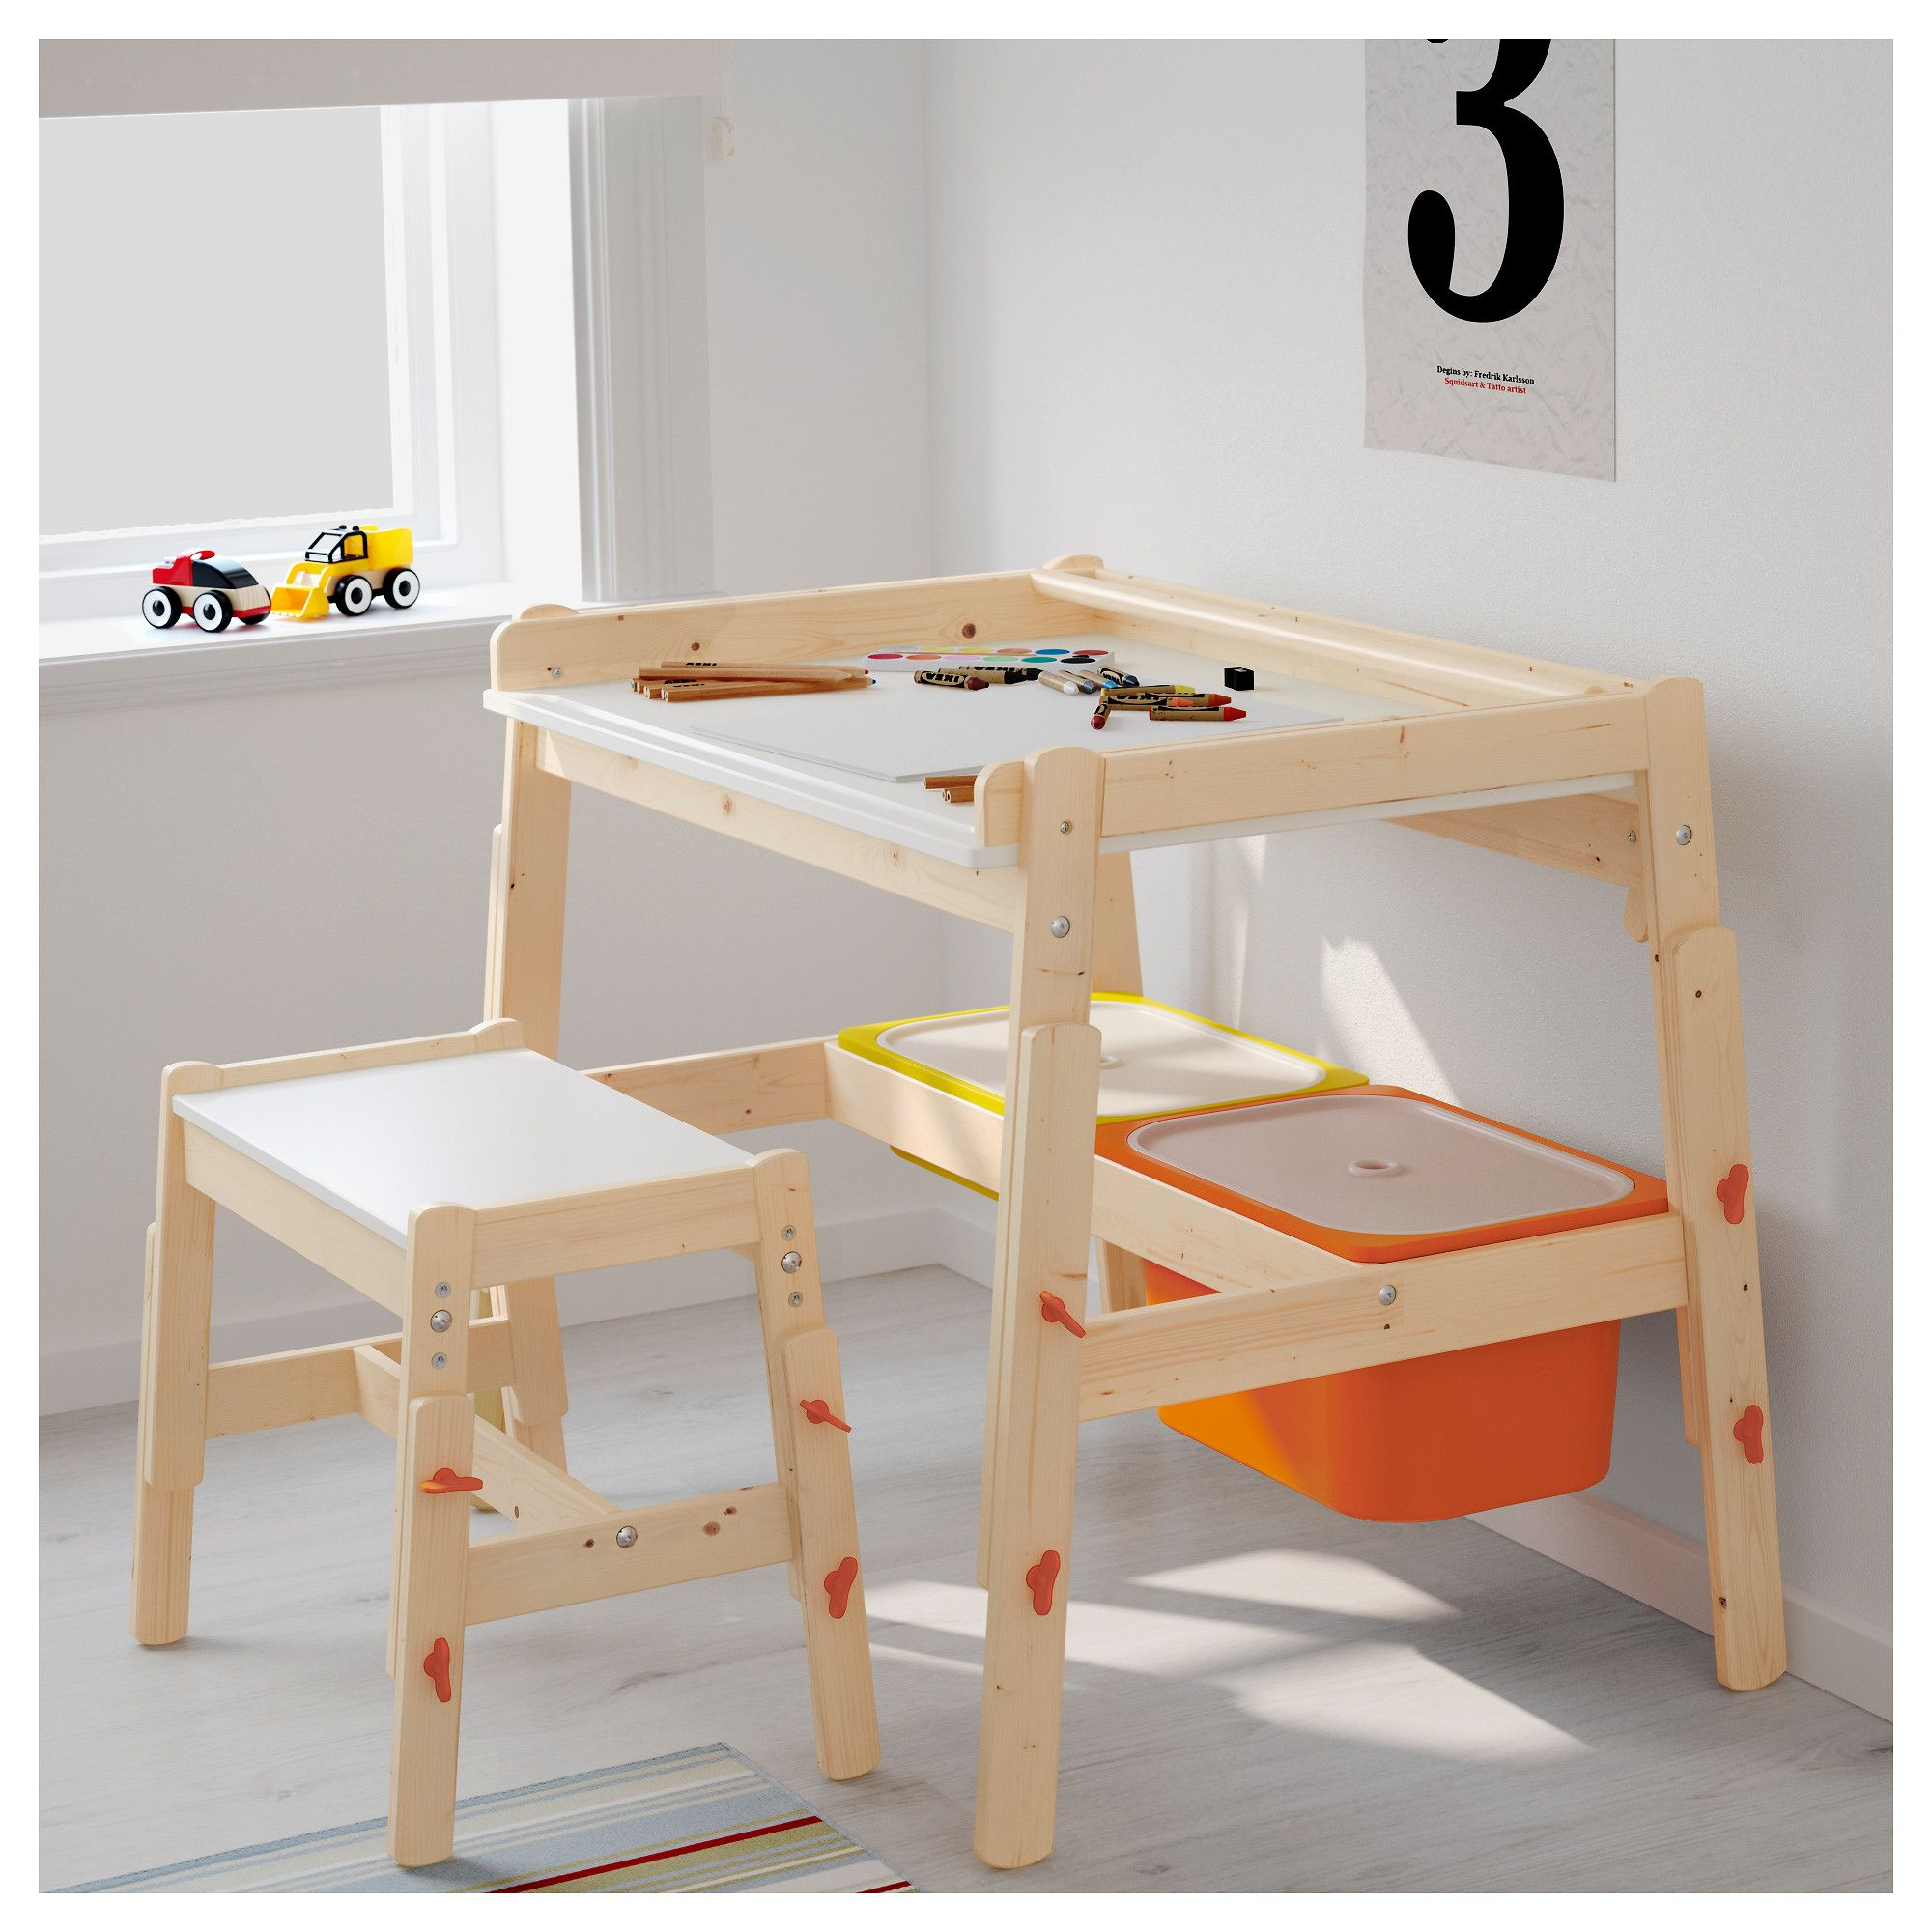 ikea flisat child s bench adjustable marco ikea childrens desk rh pinterest com